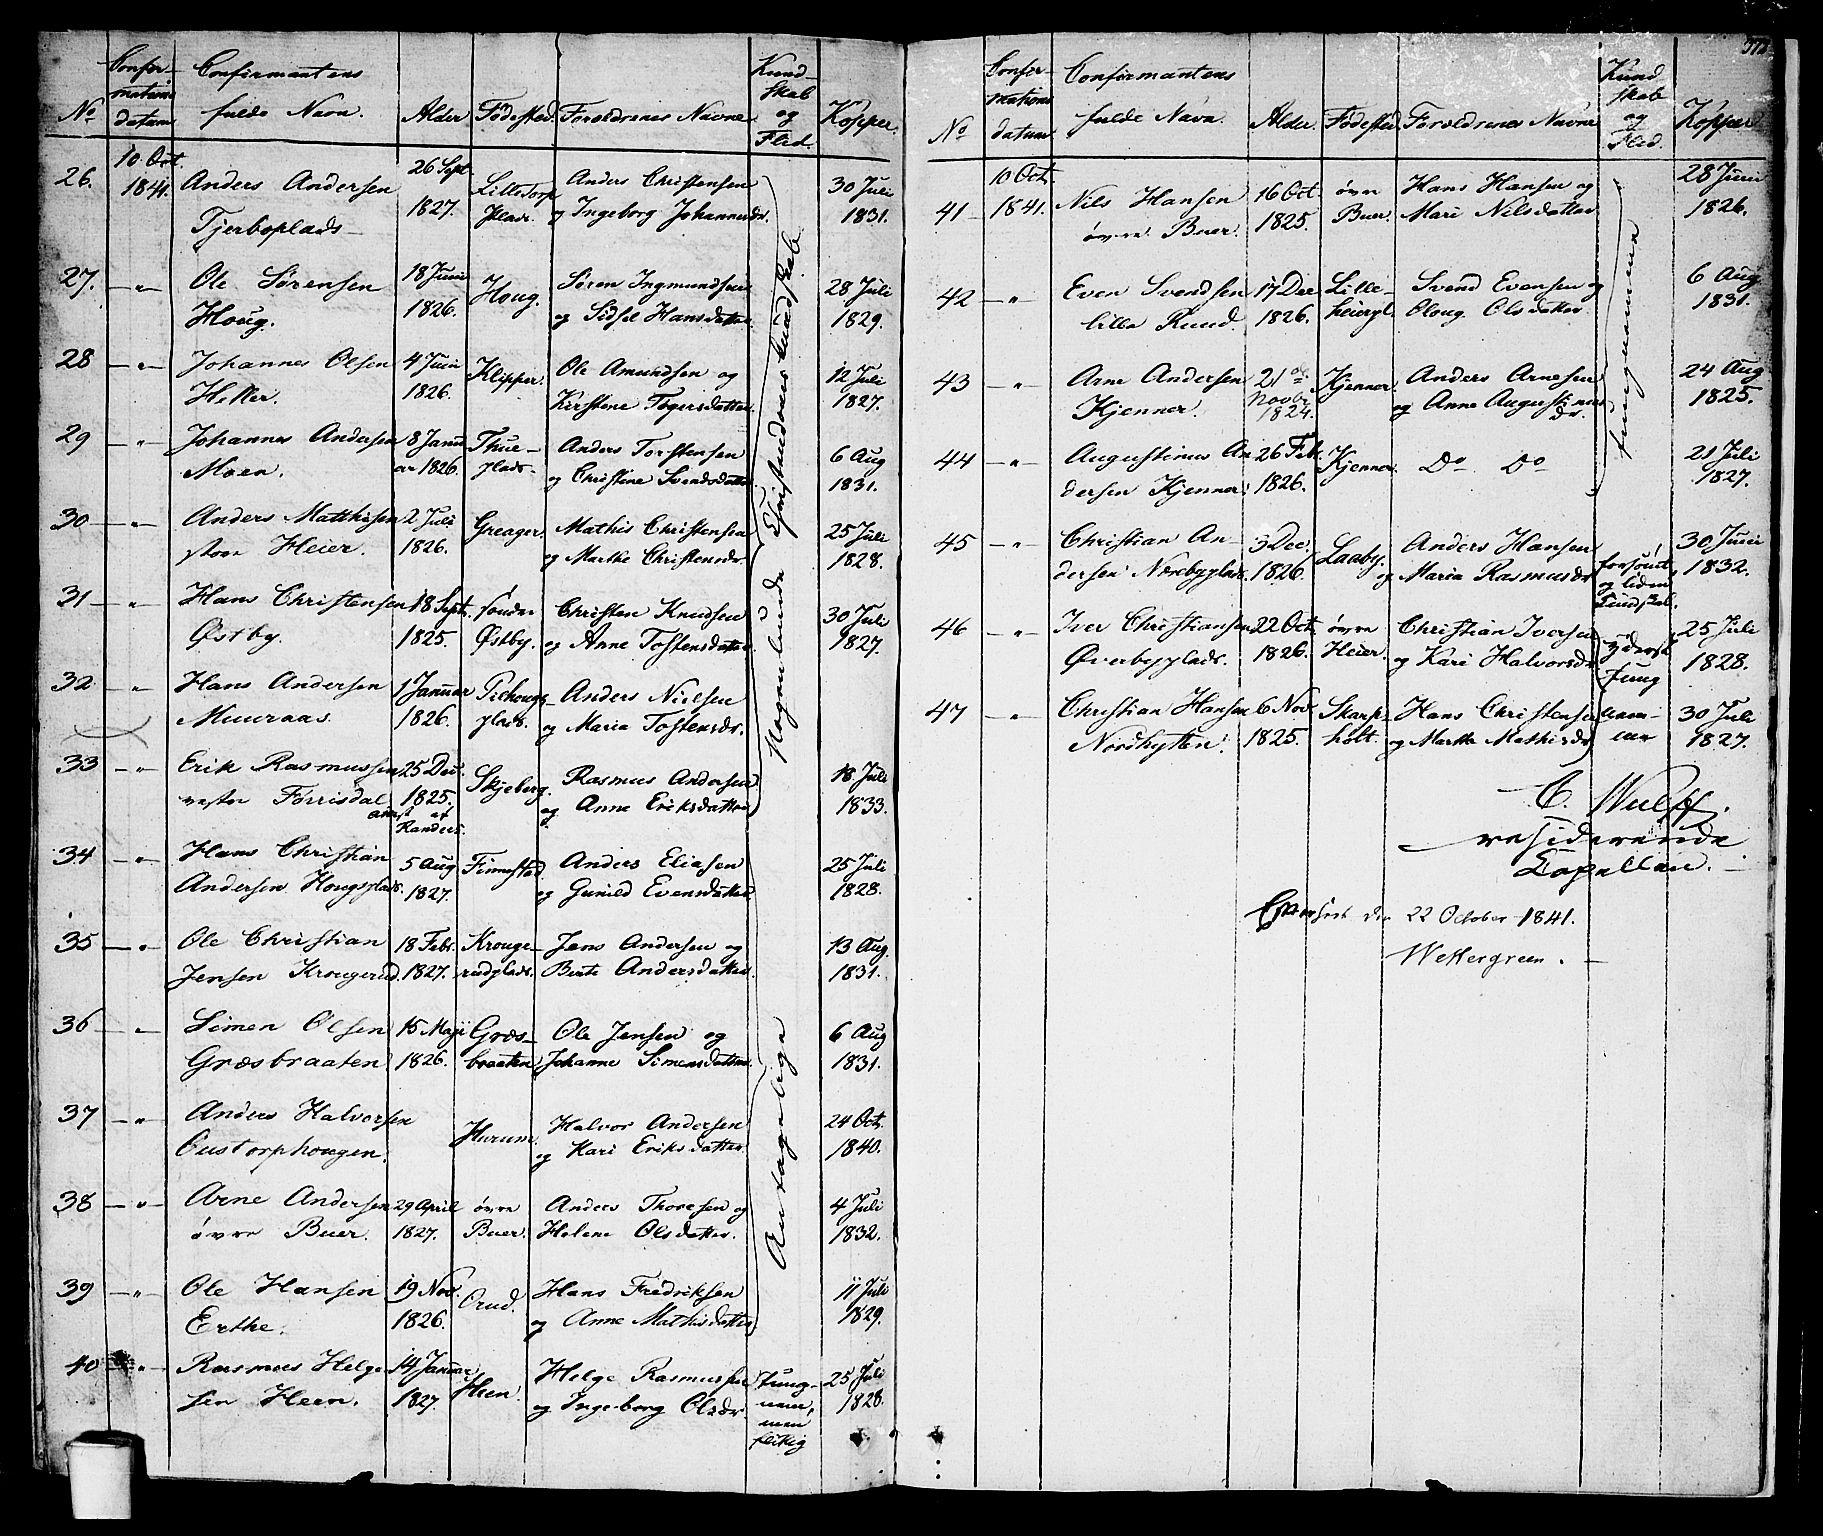 SAO, Rakkestad prestekontor Kirkebøker, F/Fa/L0007: Ministerialbok nr. I 7, 1825-1841, s. 372